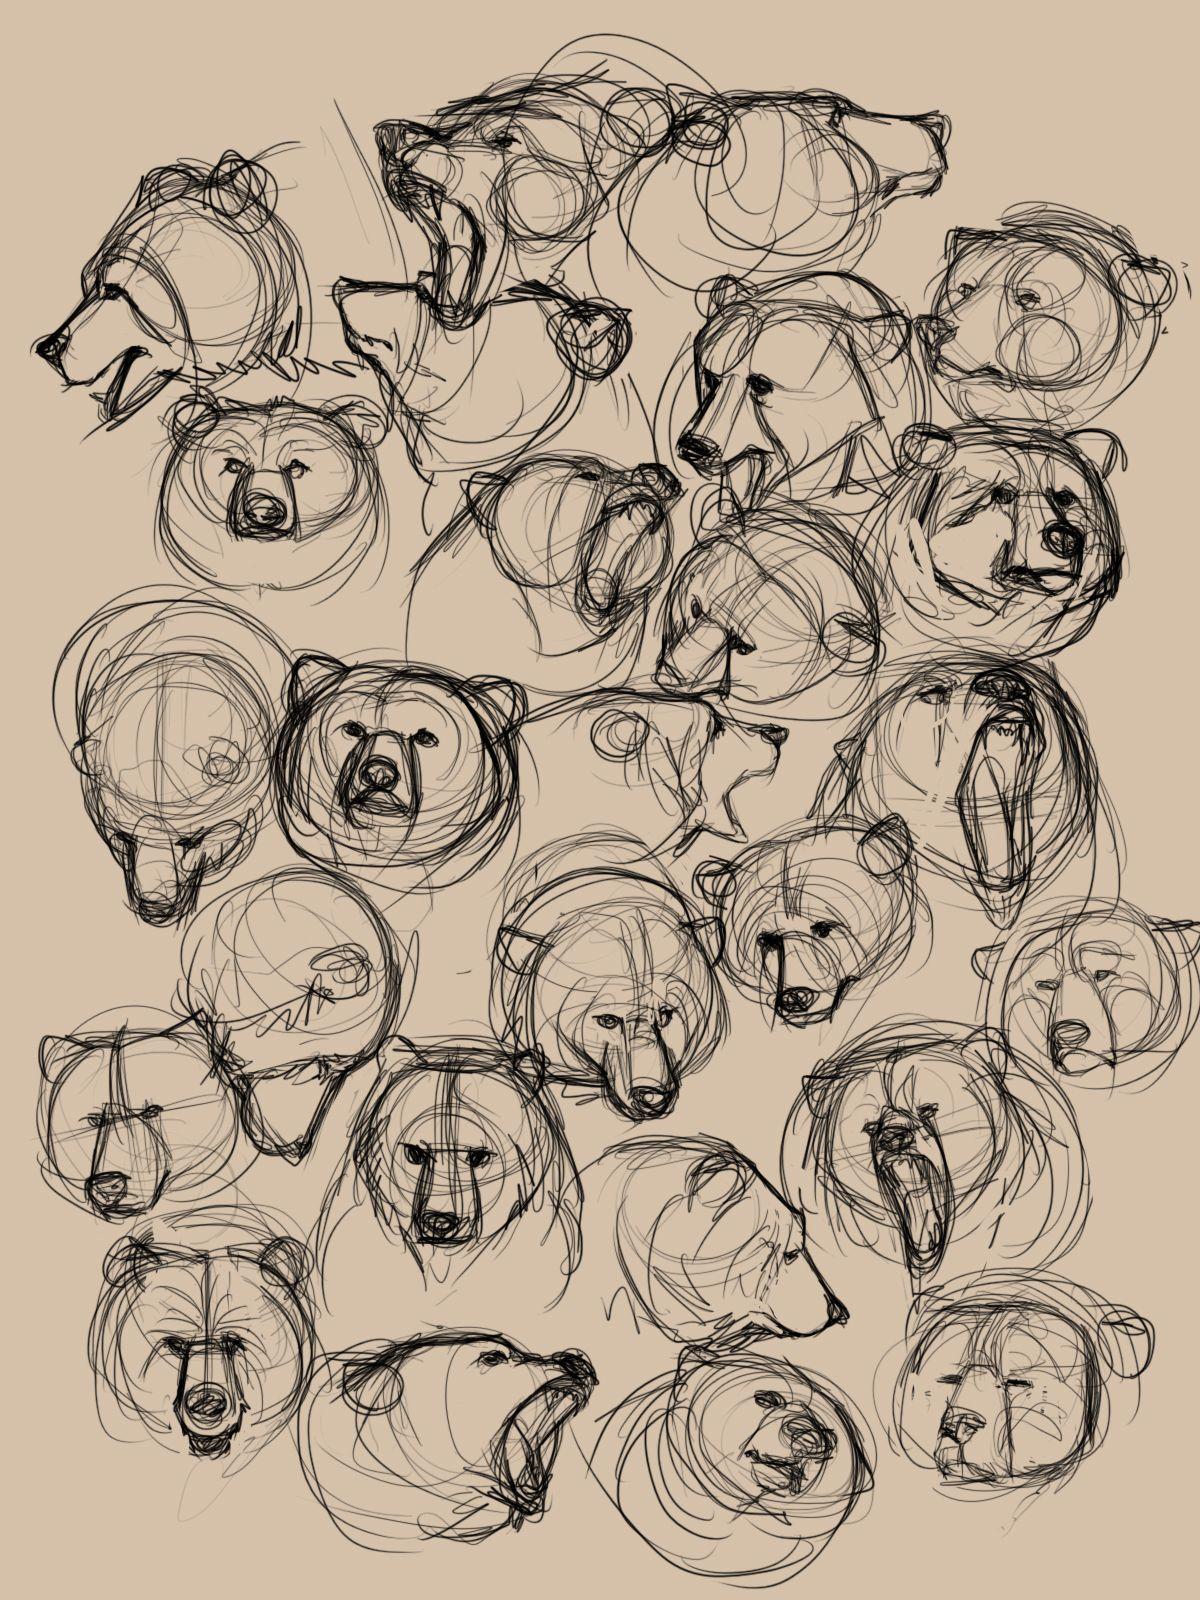 sketchandstudy | Drawing Objects - Line | Pinterest | Bear art, Art ...